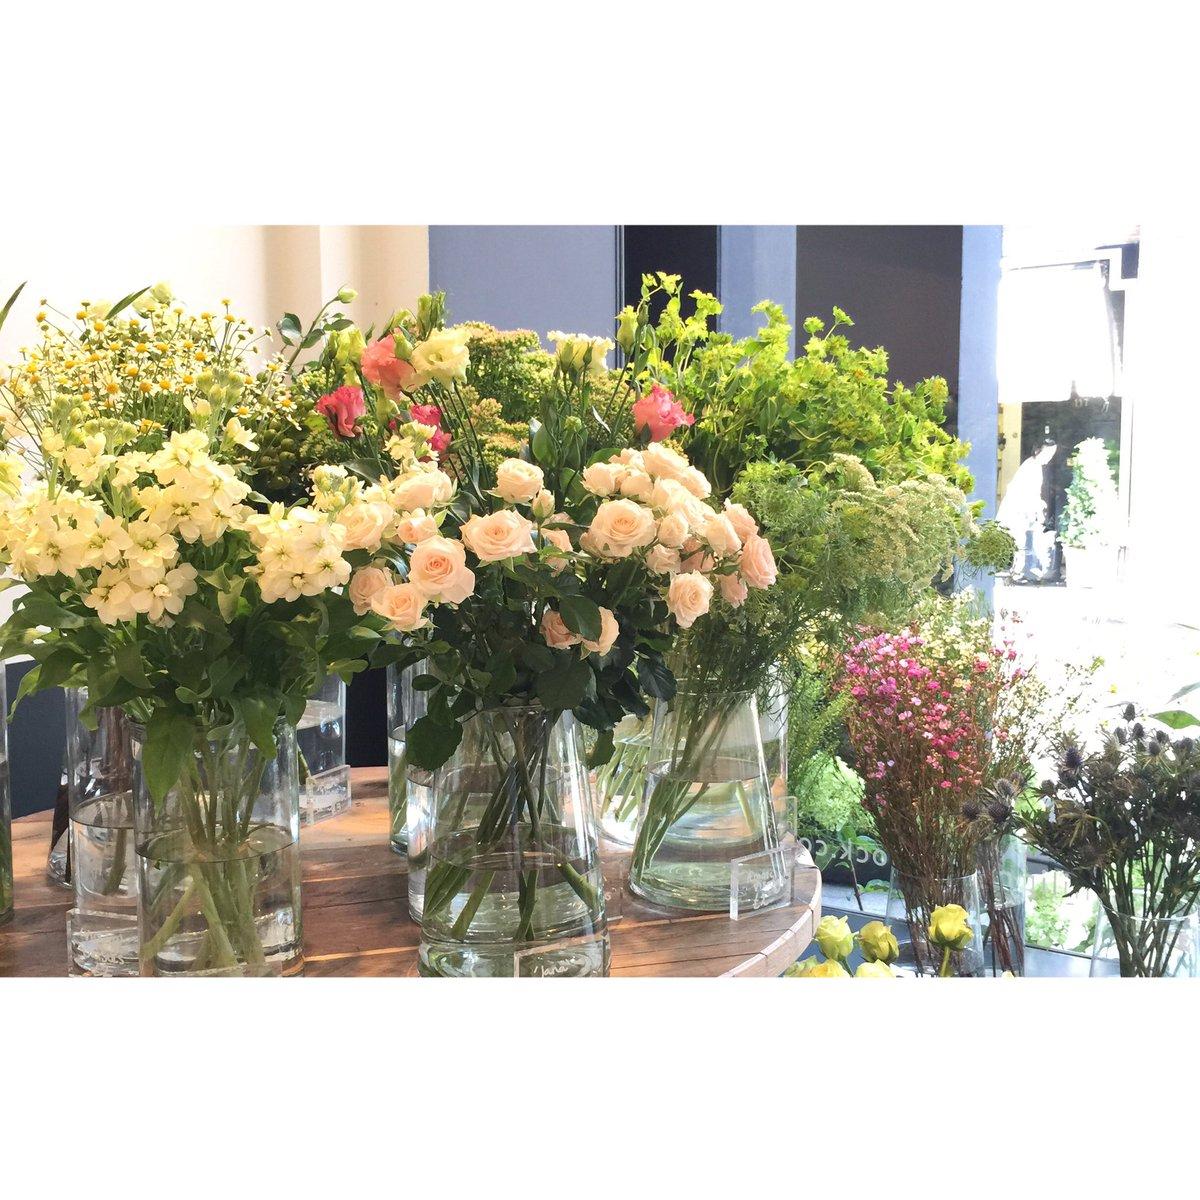 Philippa craddock on twitter a sunny start with these beautiful philippa craddock on twitter a sunny start with these beautiful flowers at our walton st flower shop luxury london florists httpstaanfl3aqgt izmirmasajfo